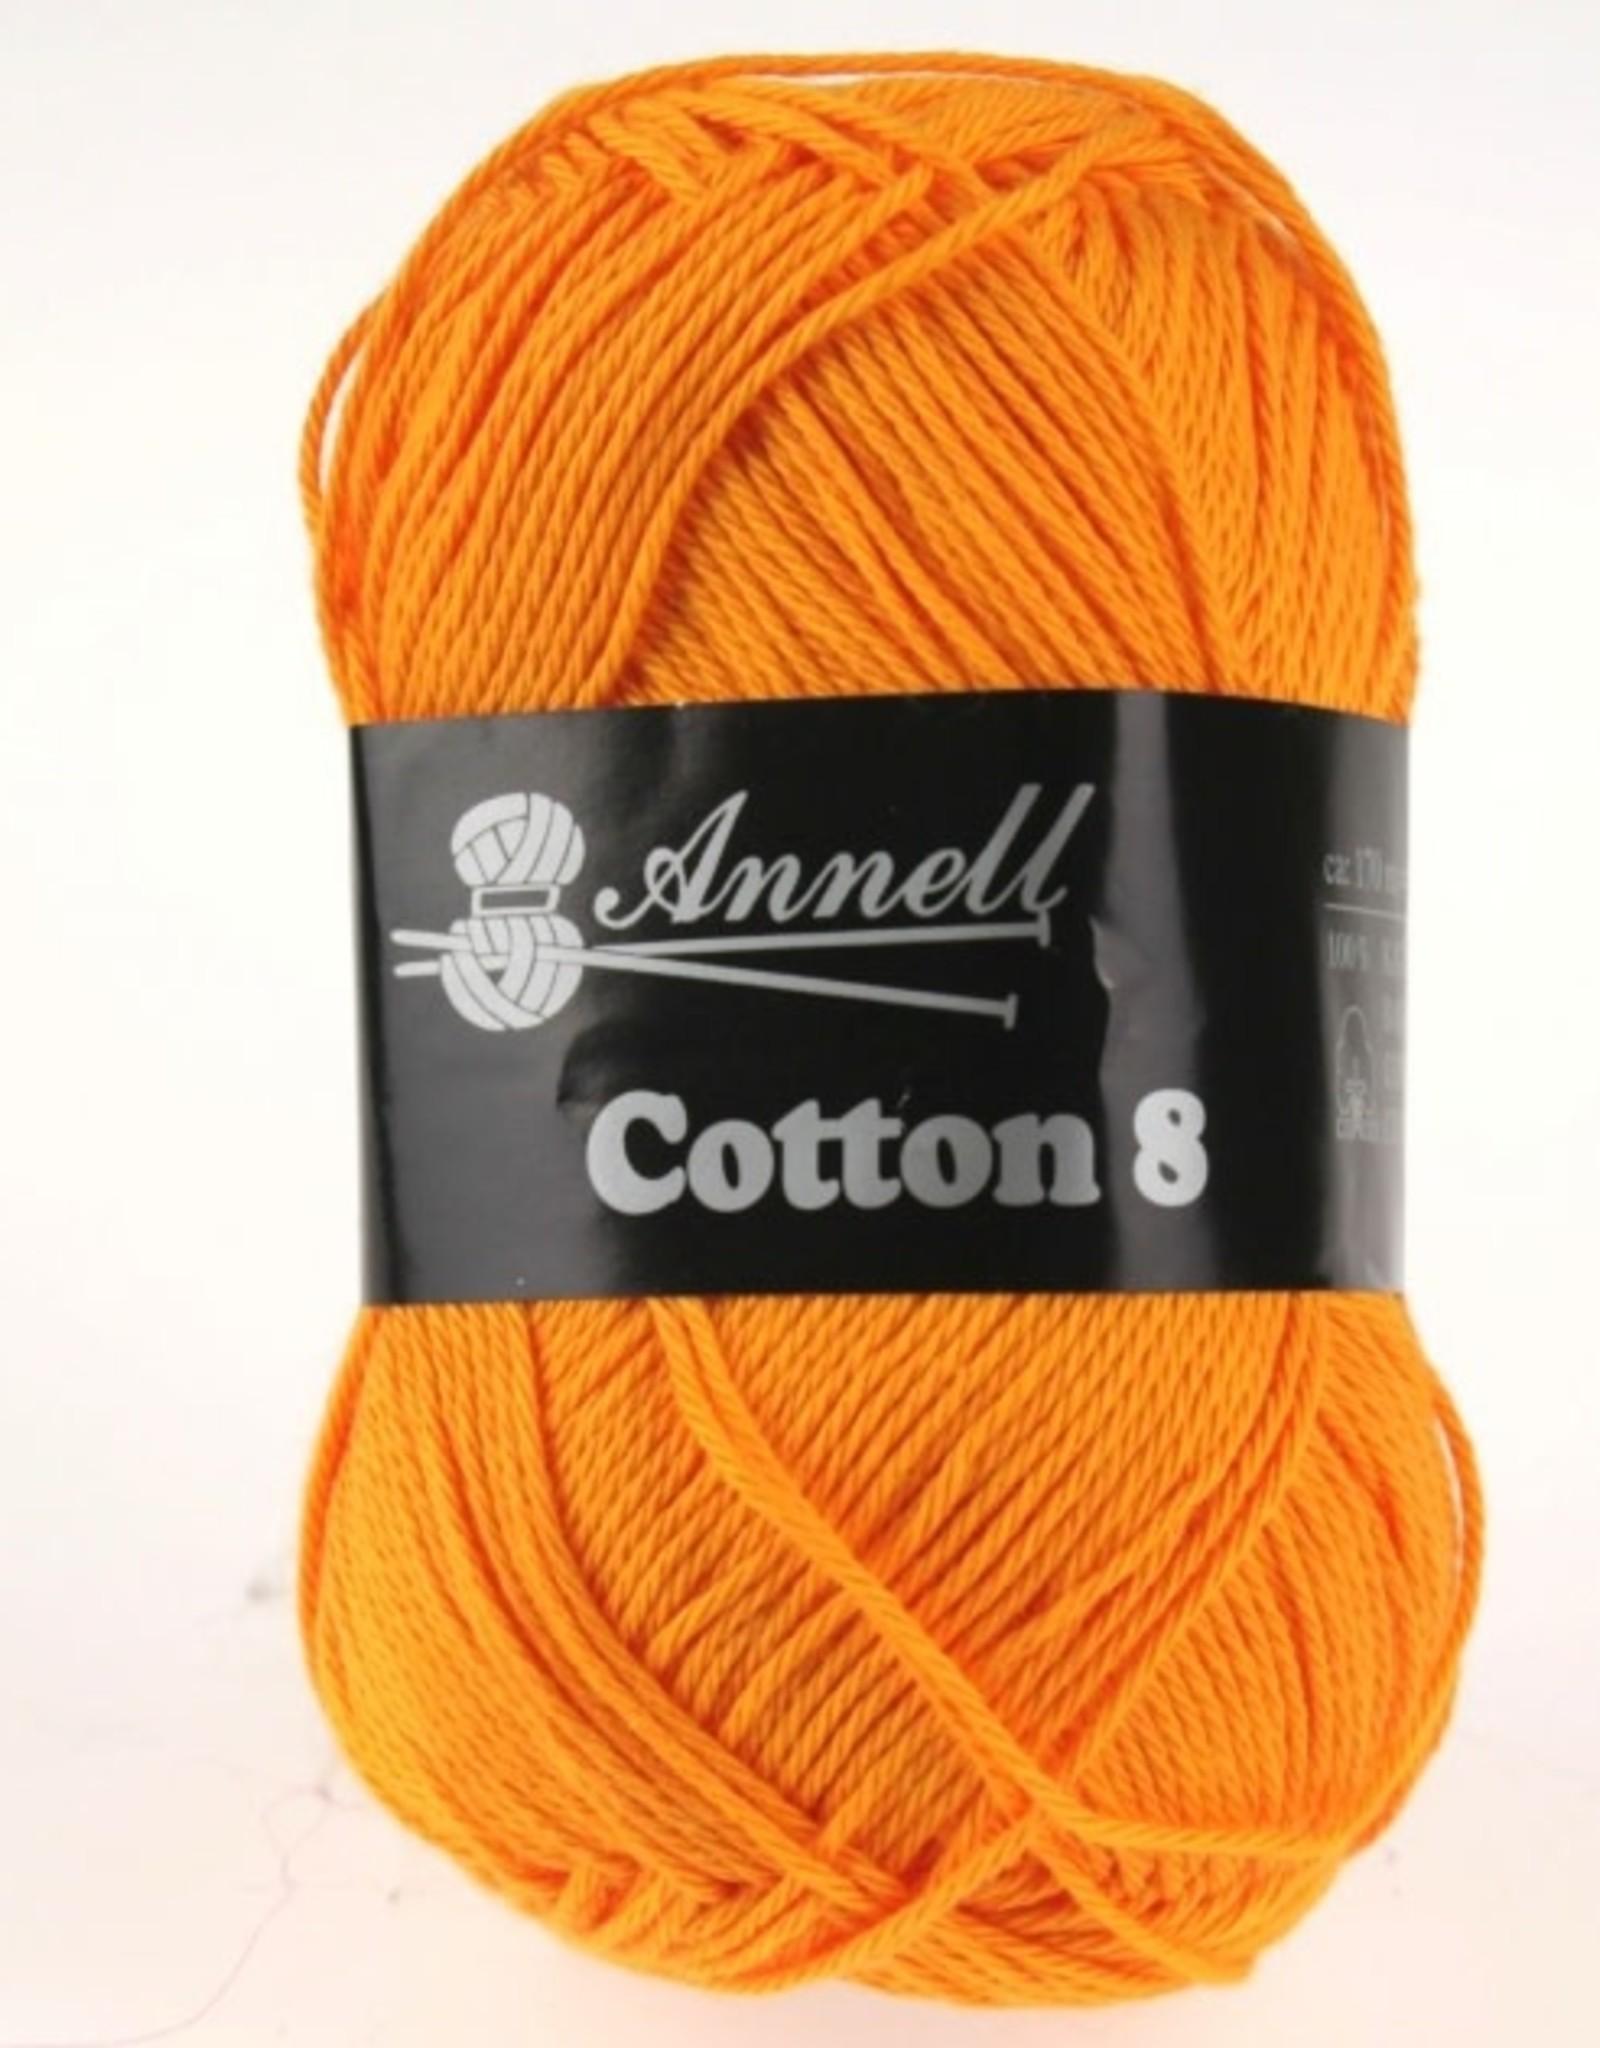 Annell Annell Cotton 8 21